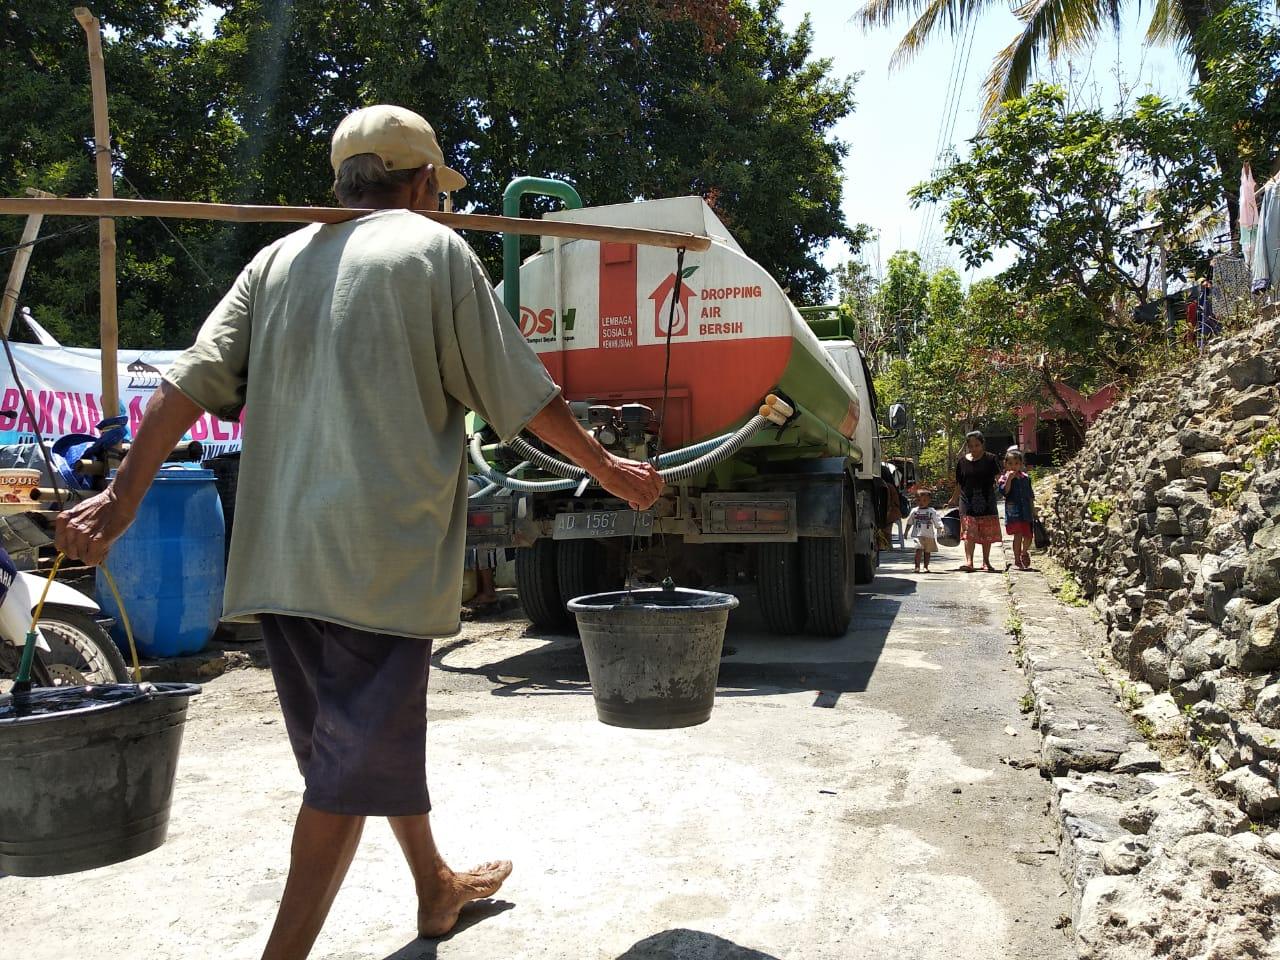 Droping Air daerah yang mengalami kesulitan Air bersih